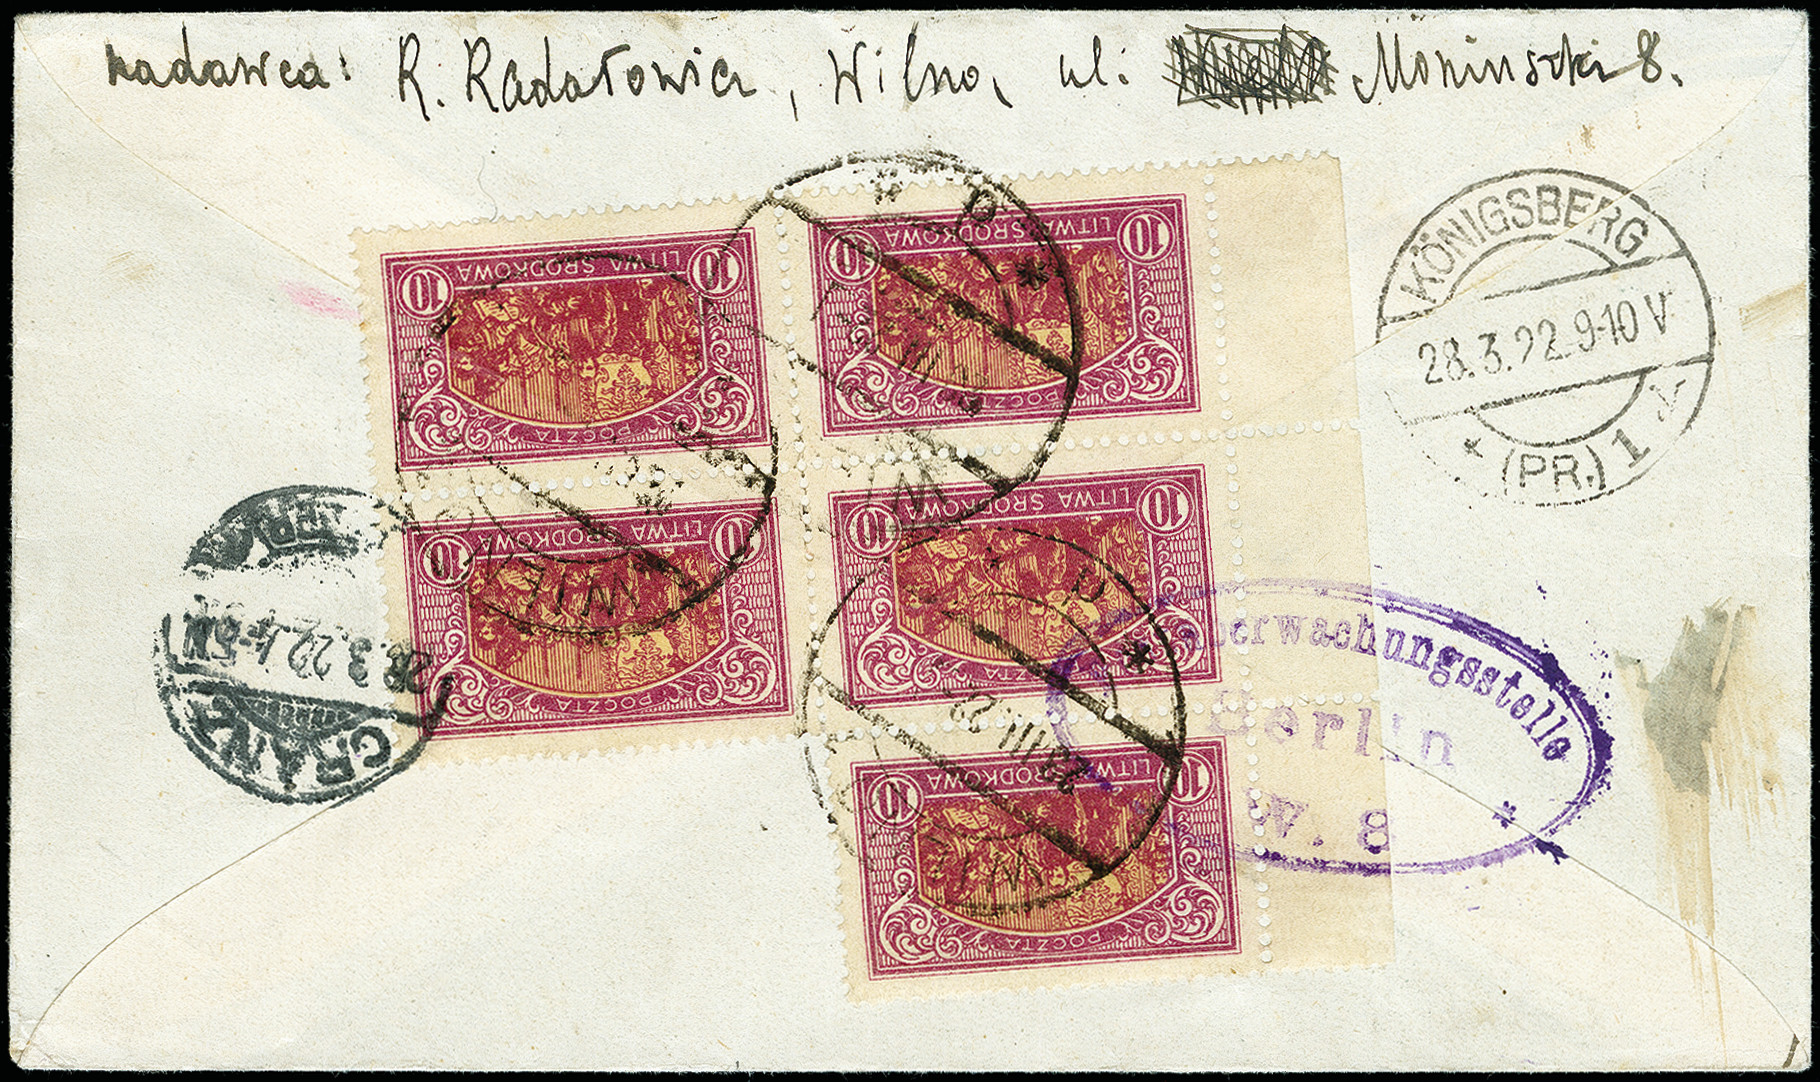 Lot 171 - europe central lithuania -  Heinrich Koehler Auktionen 373rd Heinrich Köhler auction - Day 1